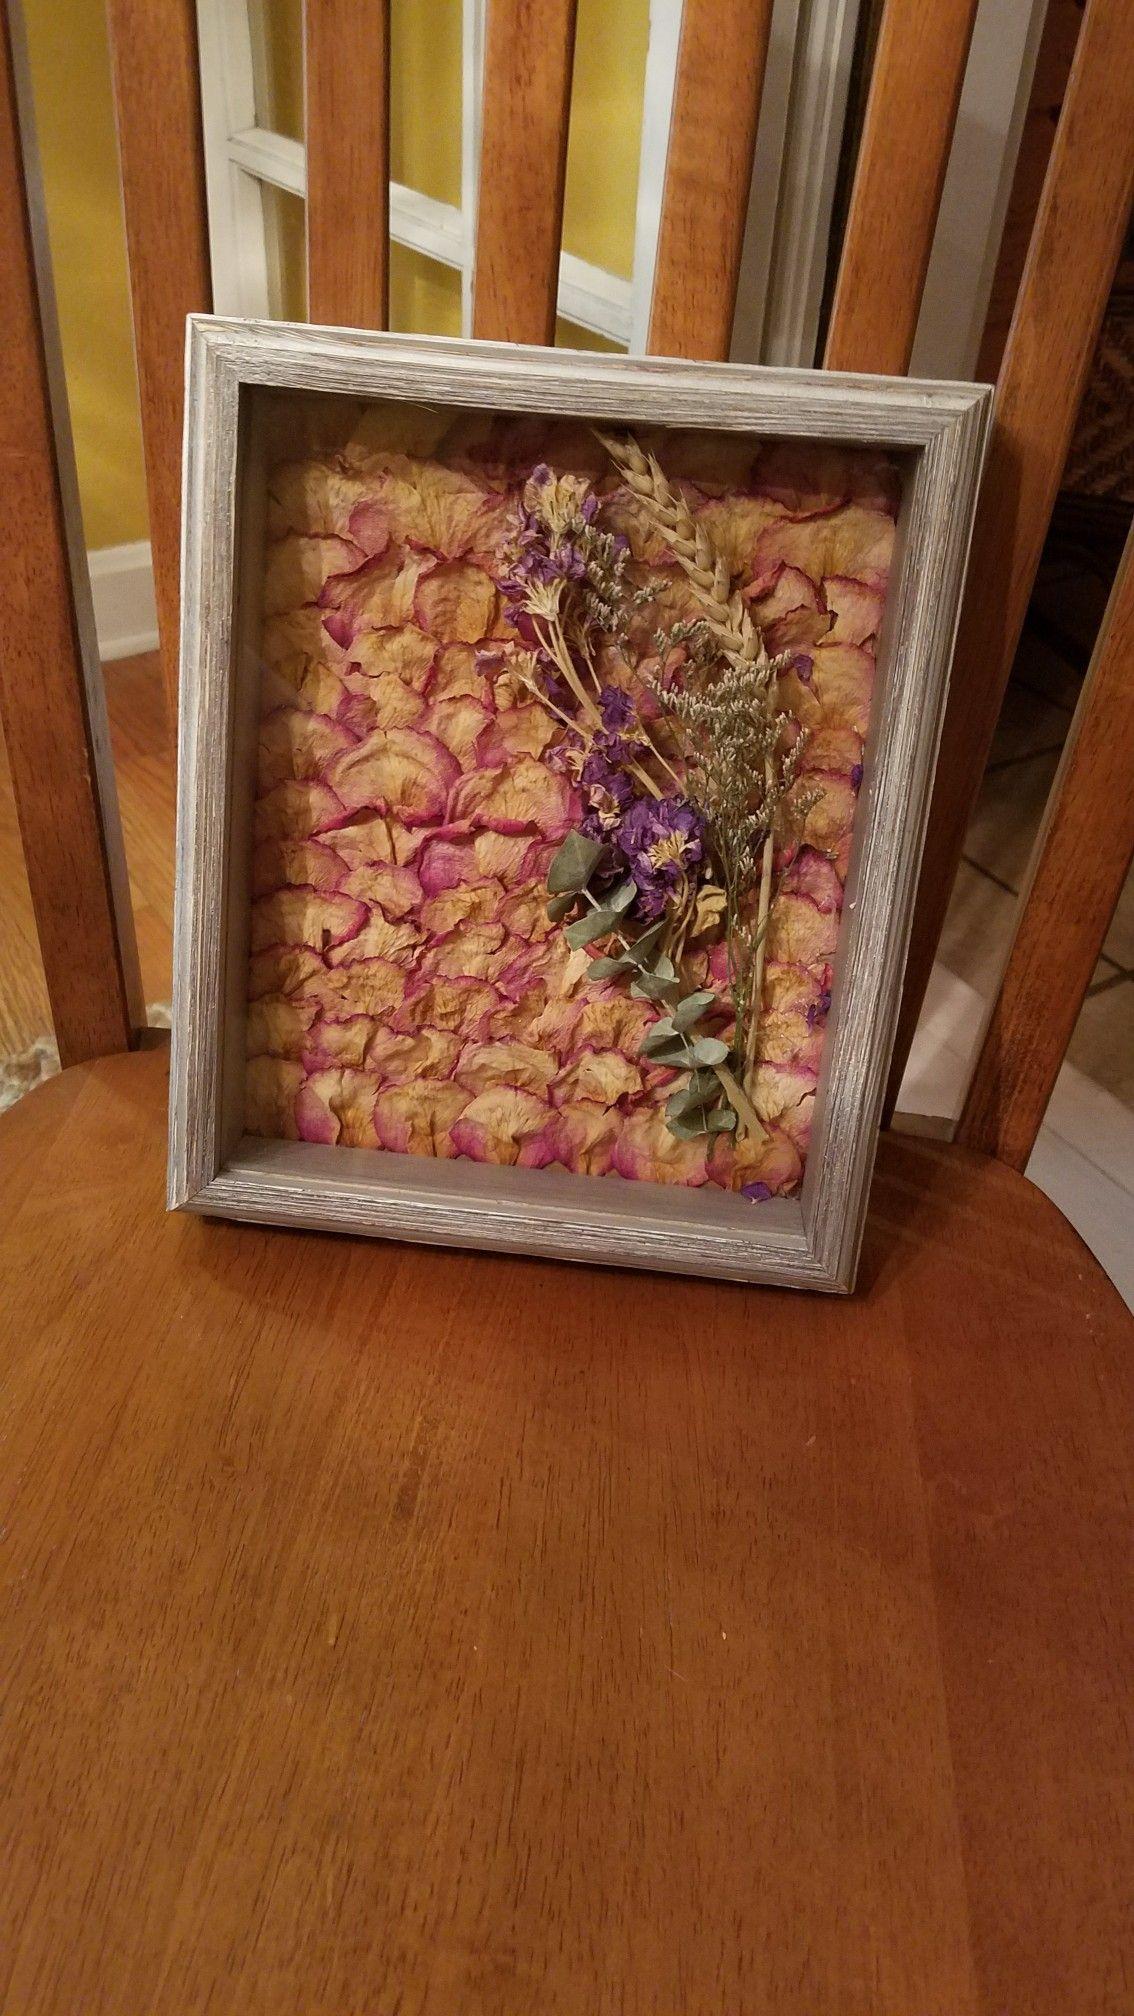 Funeral Flower Keepsake My Board Pinterest Funeral Flowers And